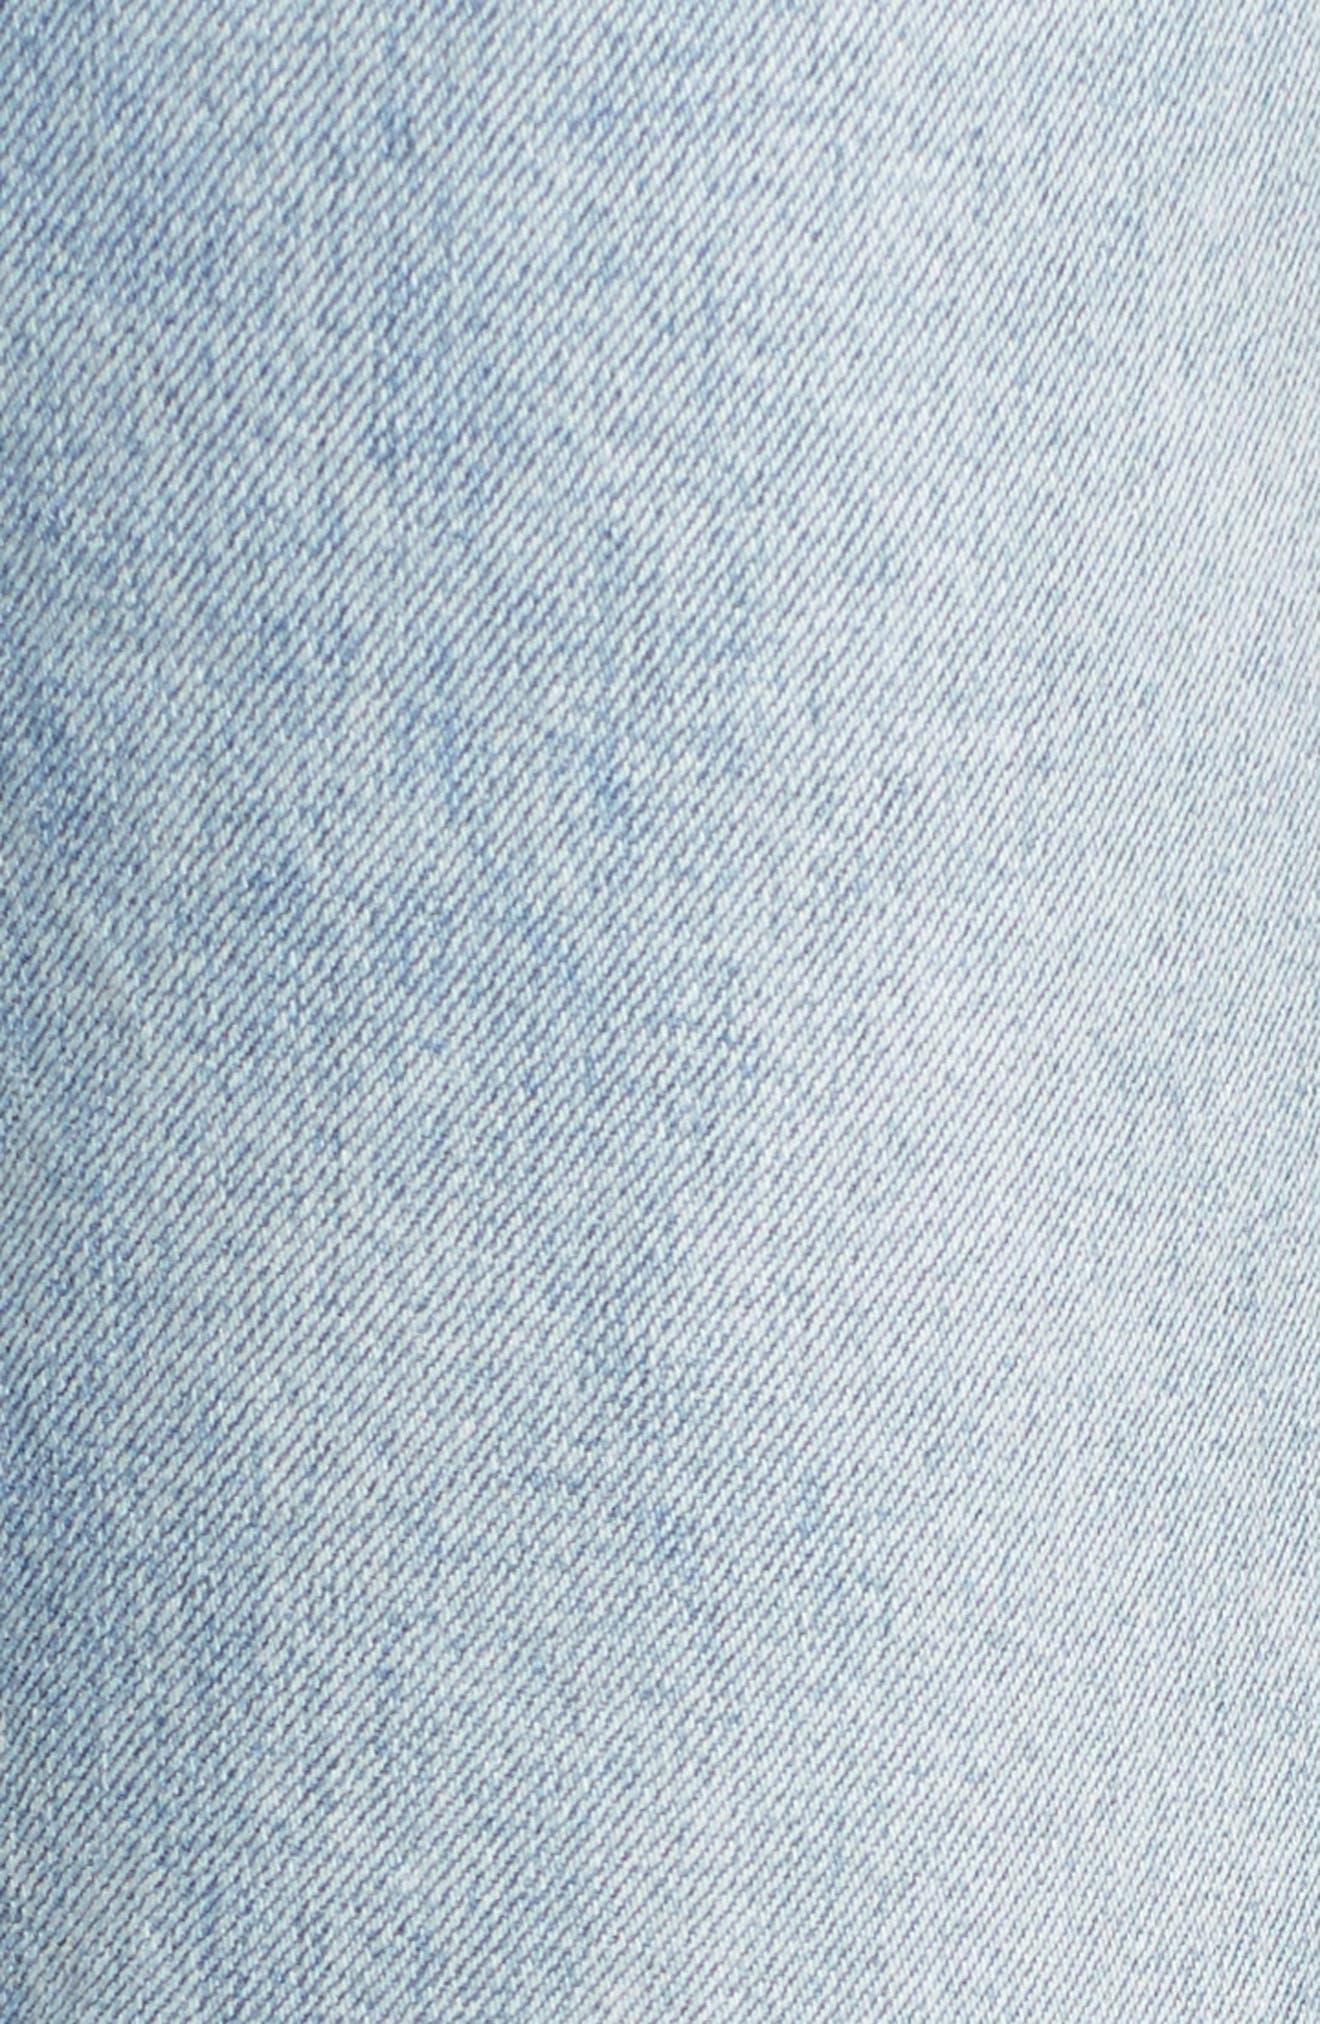 Patti Crop Straight Leg Jeans,                             Alternate thumbnail 6, color,                             Deluxe